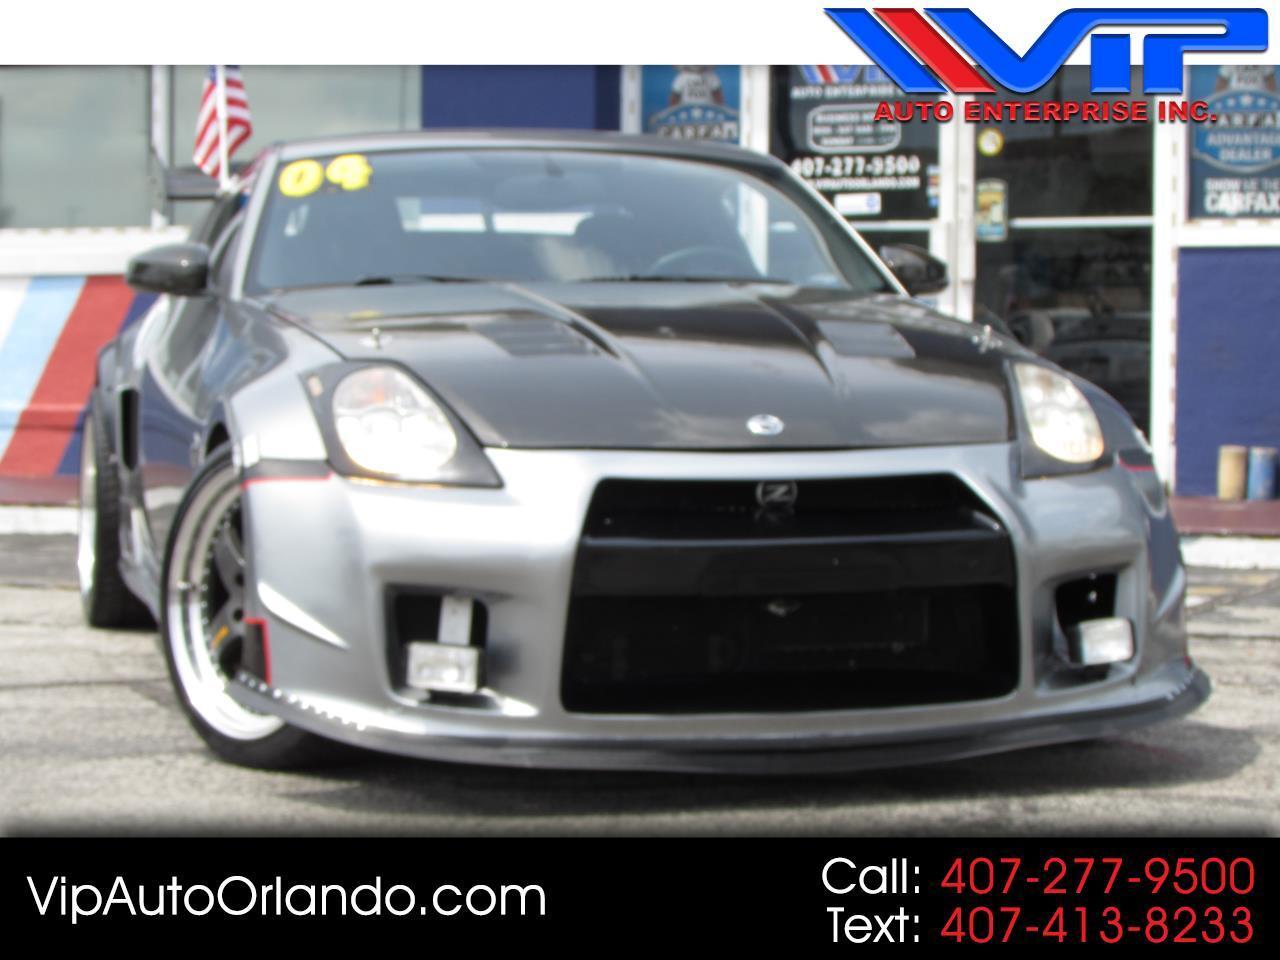 2004 Nissan 350Z 2dr Cpe Touring Auto